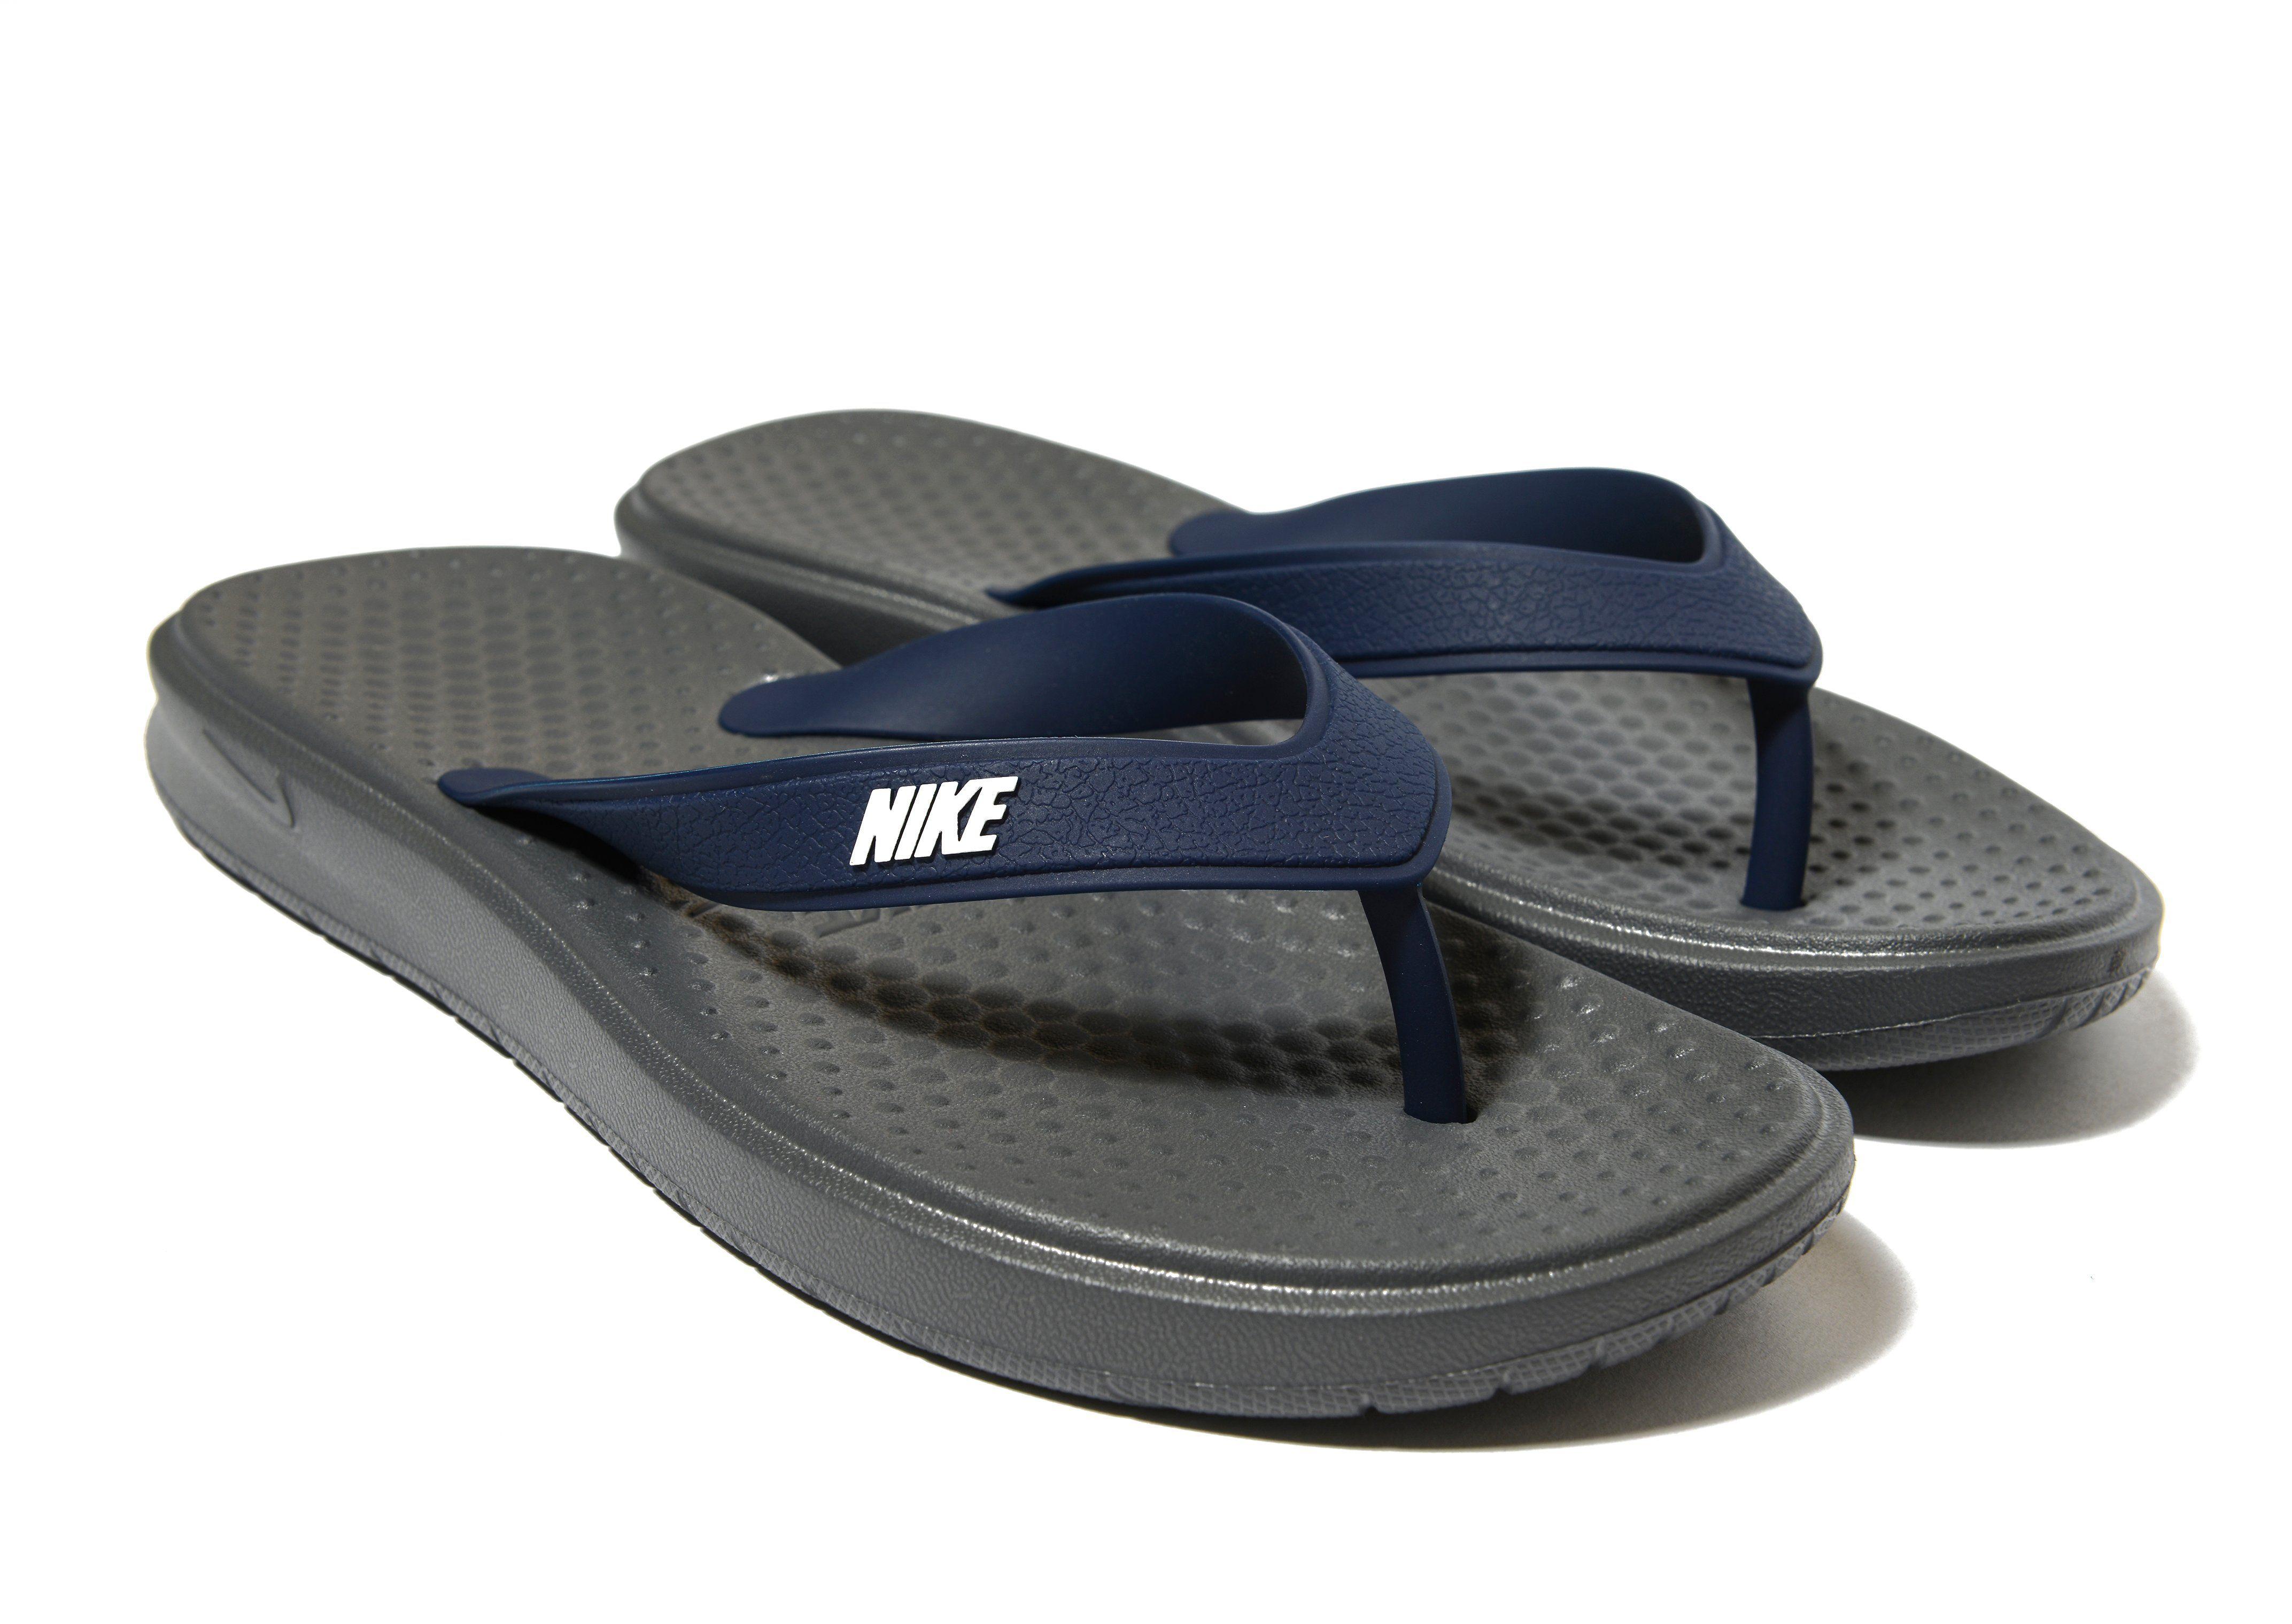 Nike Solay Flip Flops Jd Sports